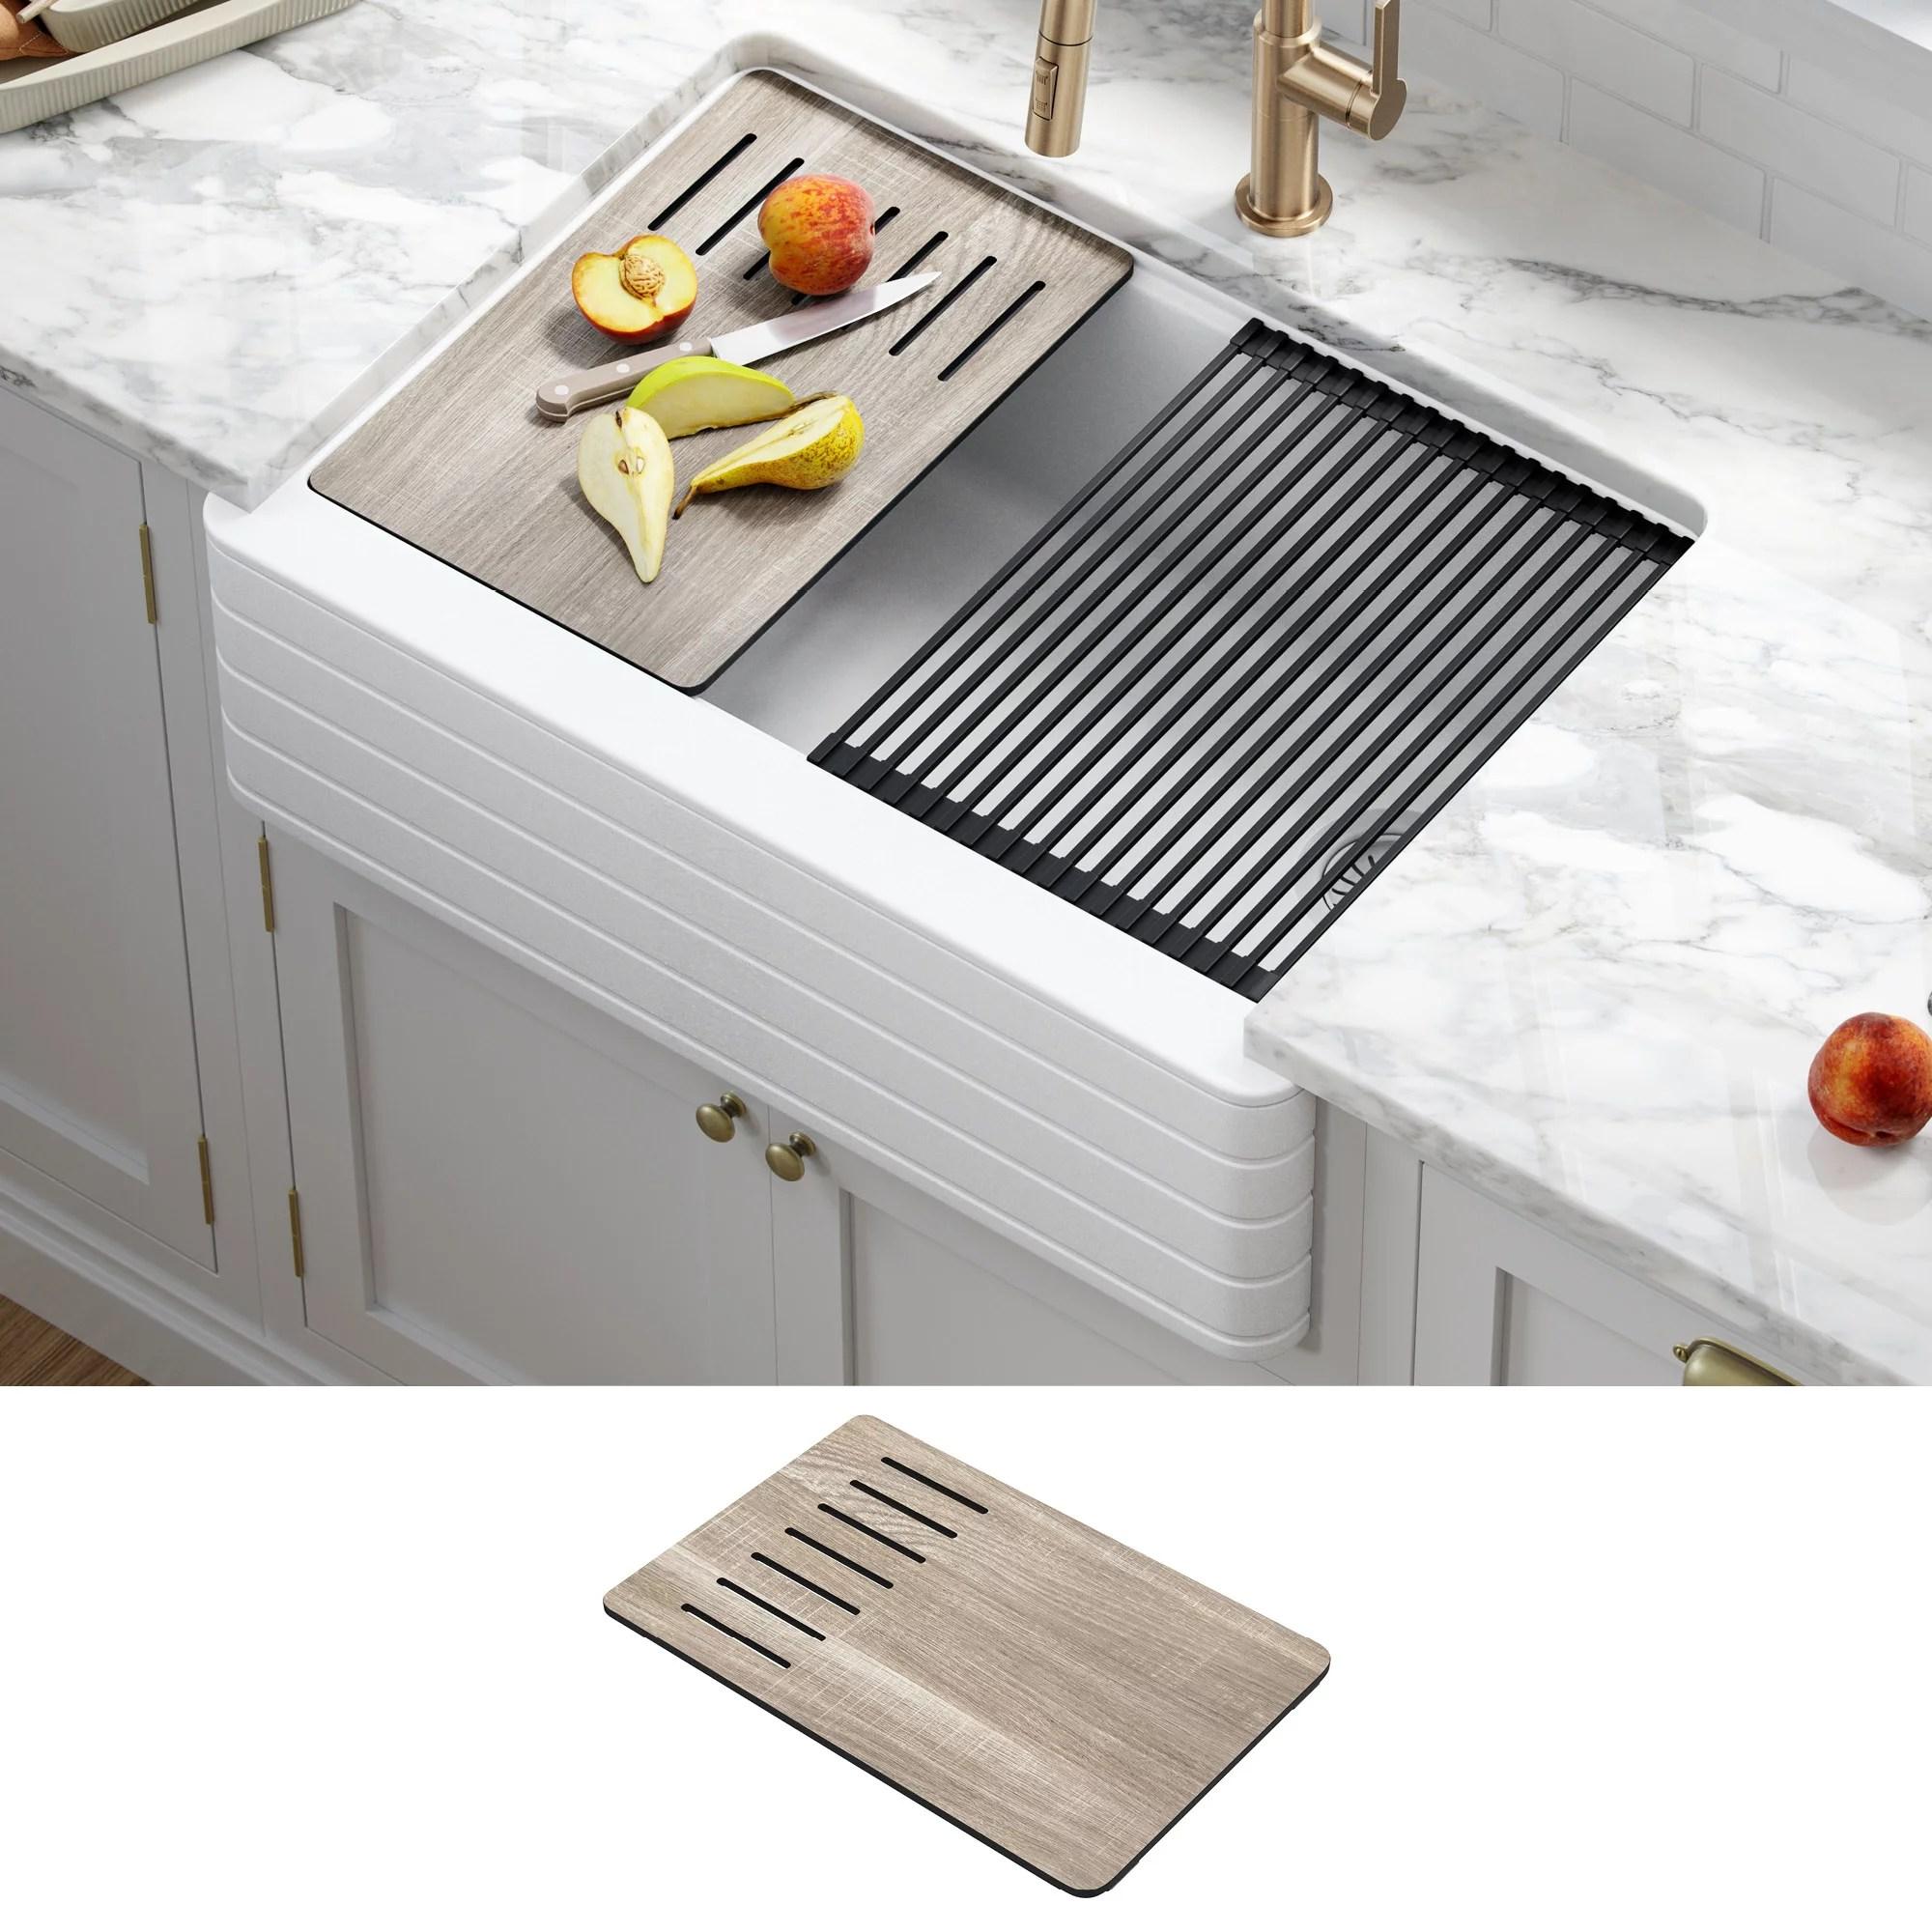 kraus bellucci workstation 30 inch farmhouse apron front granite composite single bowl kitchen sink in white with accessories walmart com